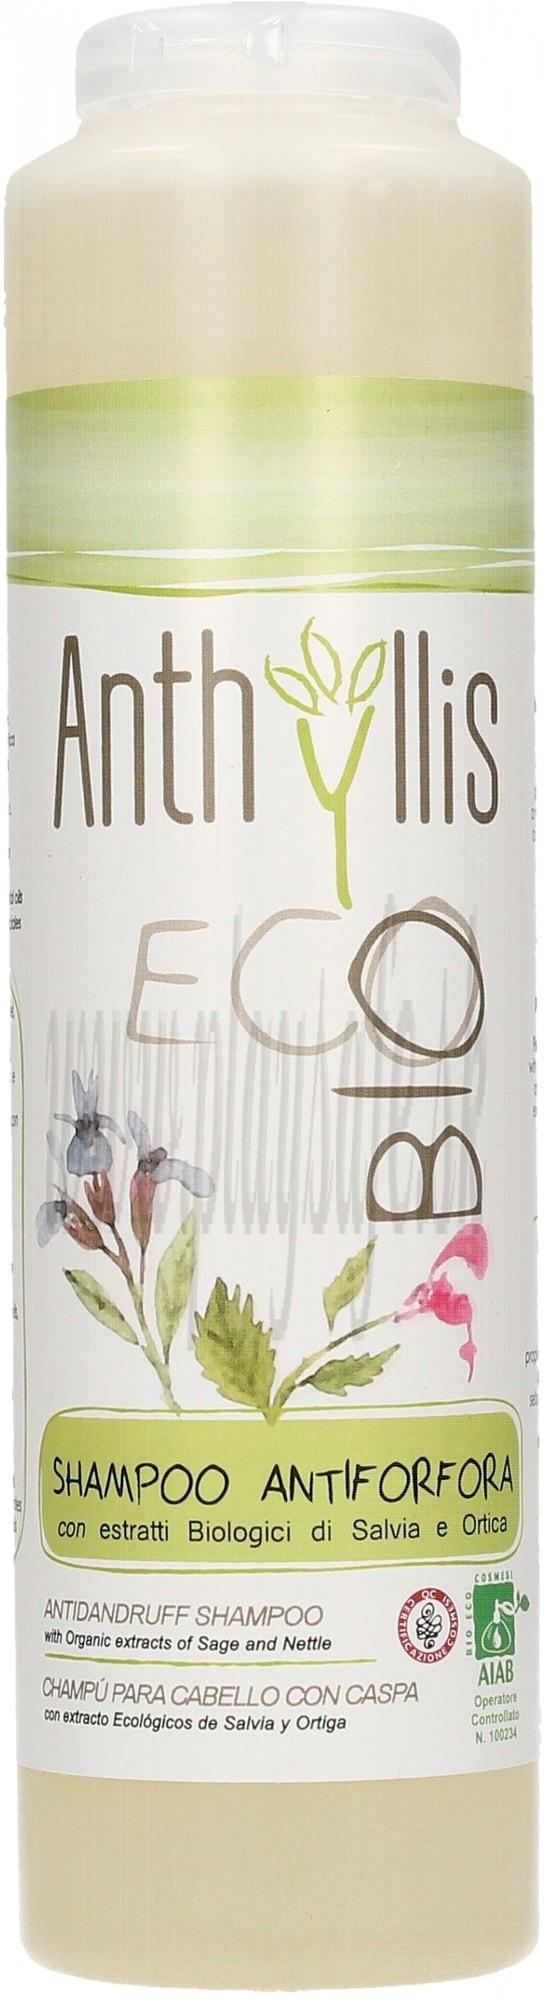 Anthyllis Šampón proti lupinám, 250ml